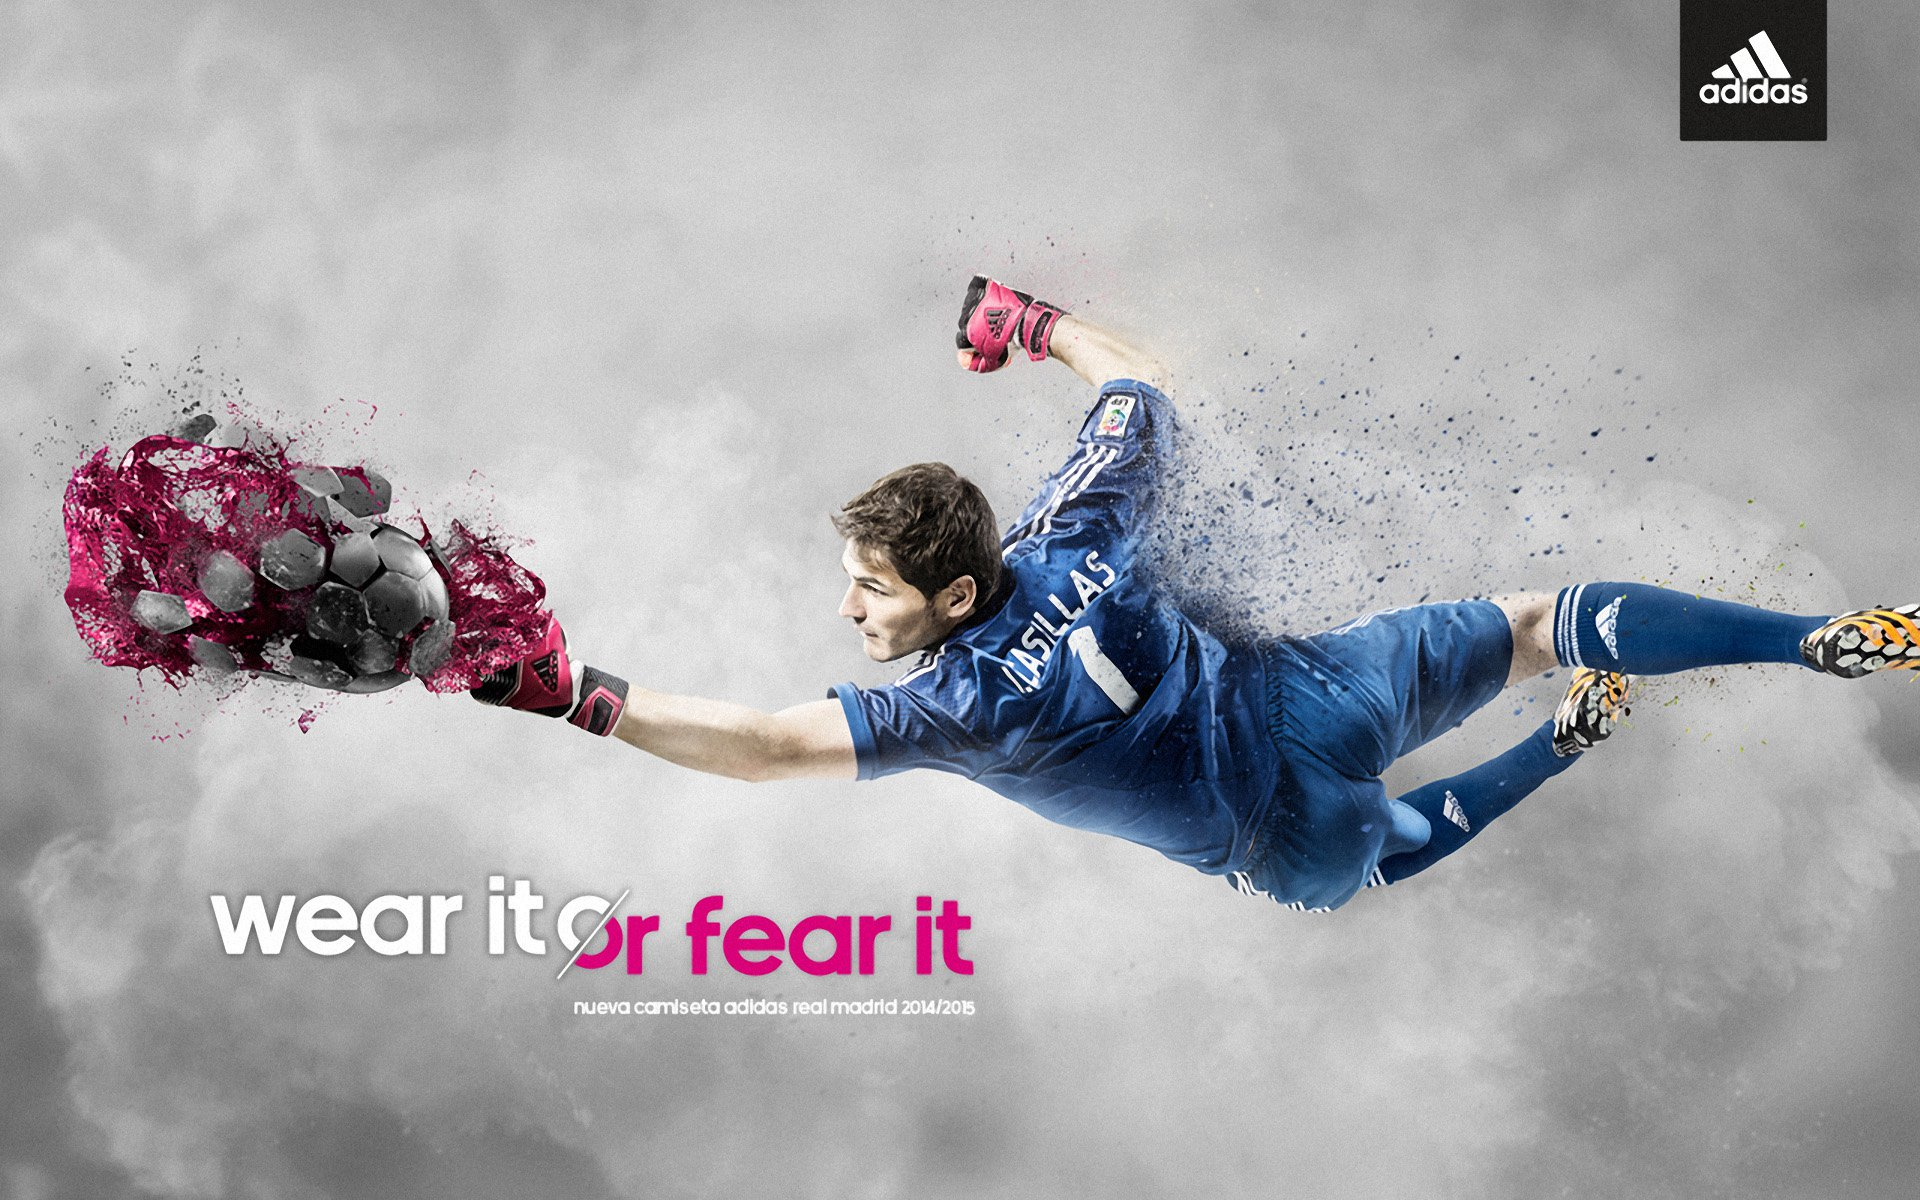 Adidas Football Wallpaper 2015 7 1920x1200